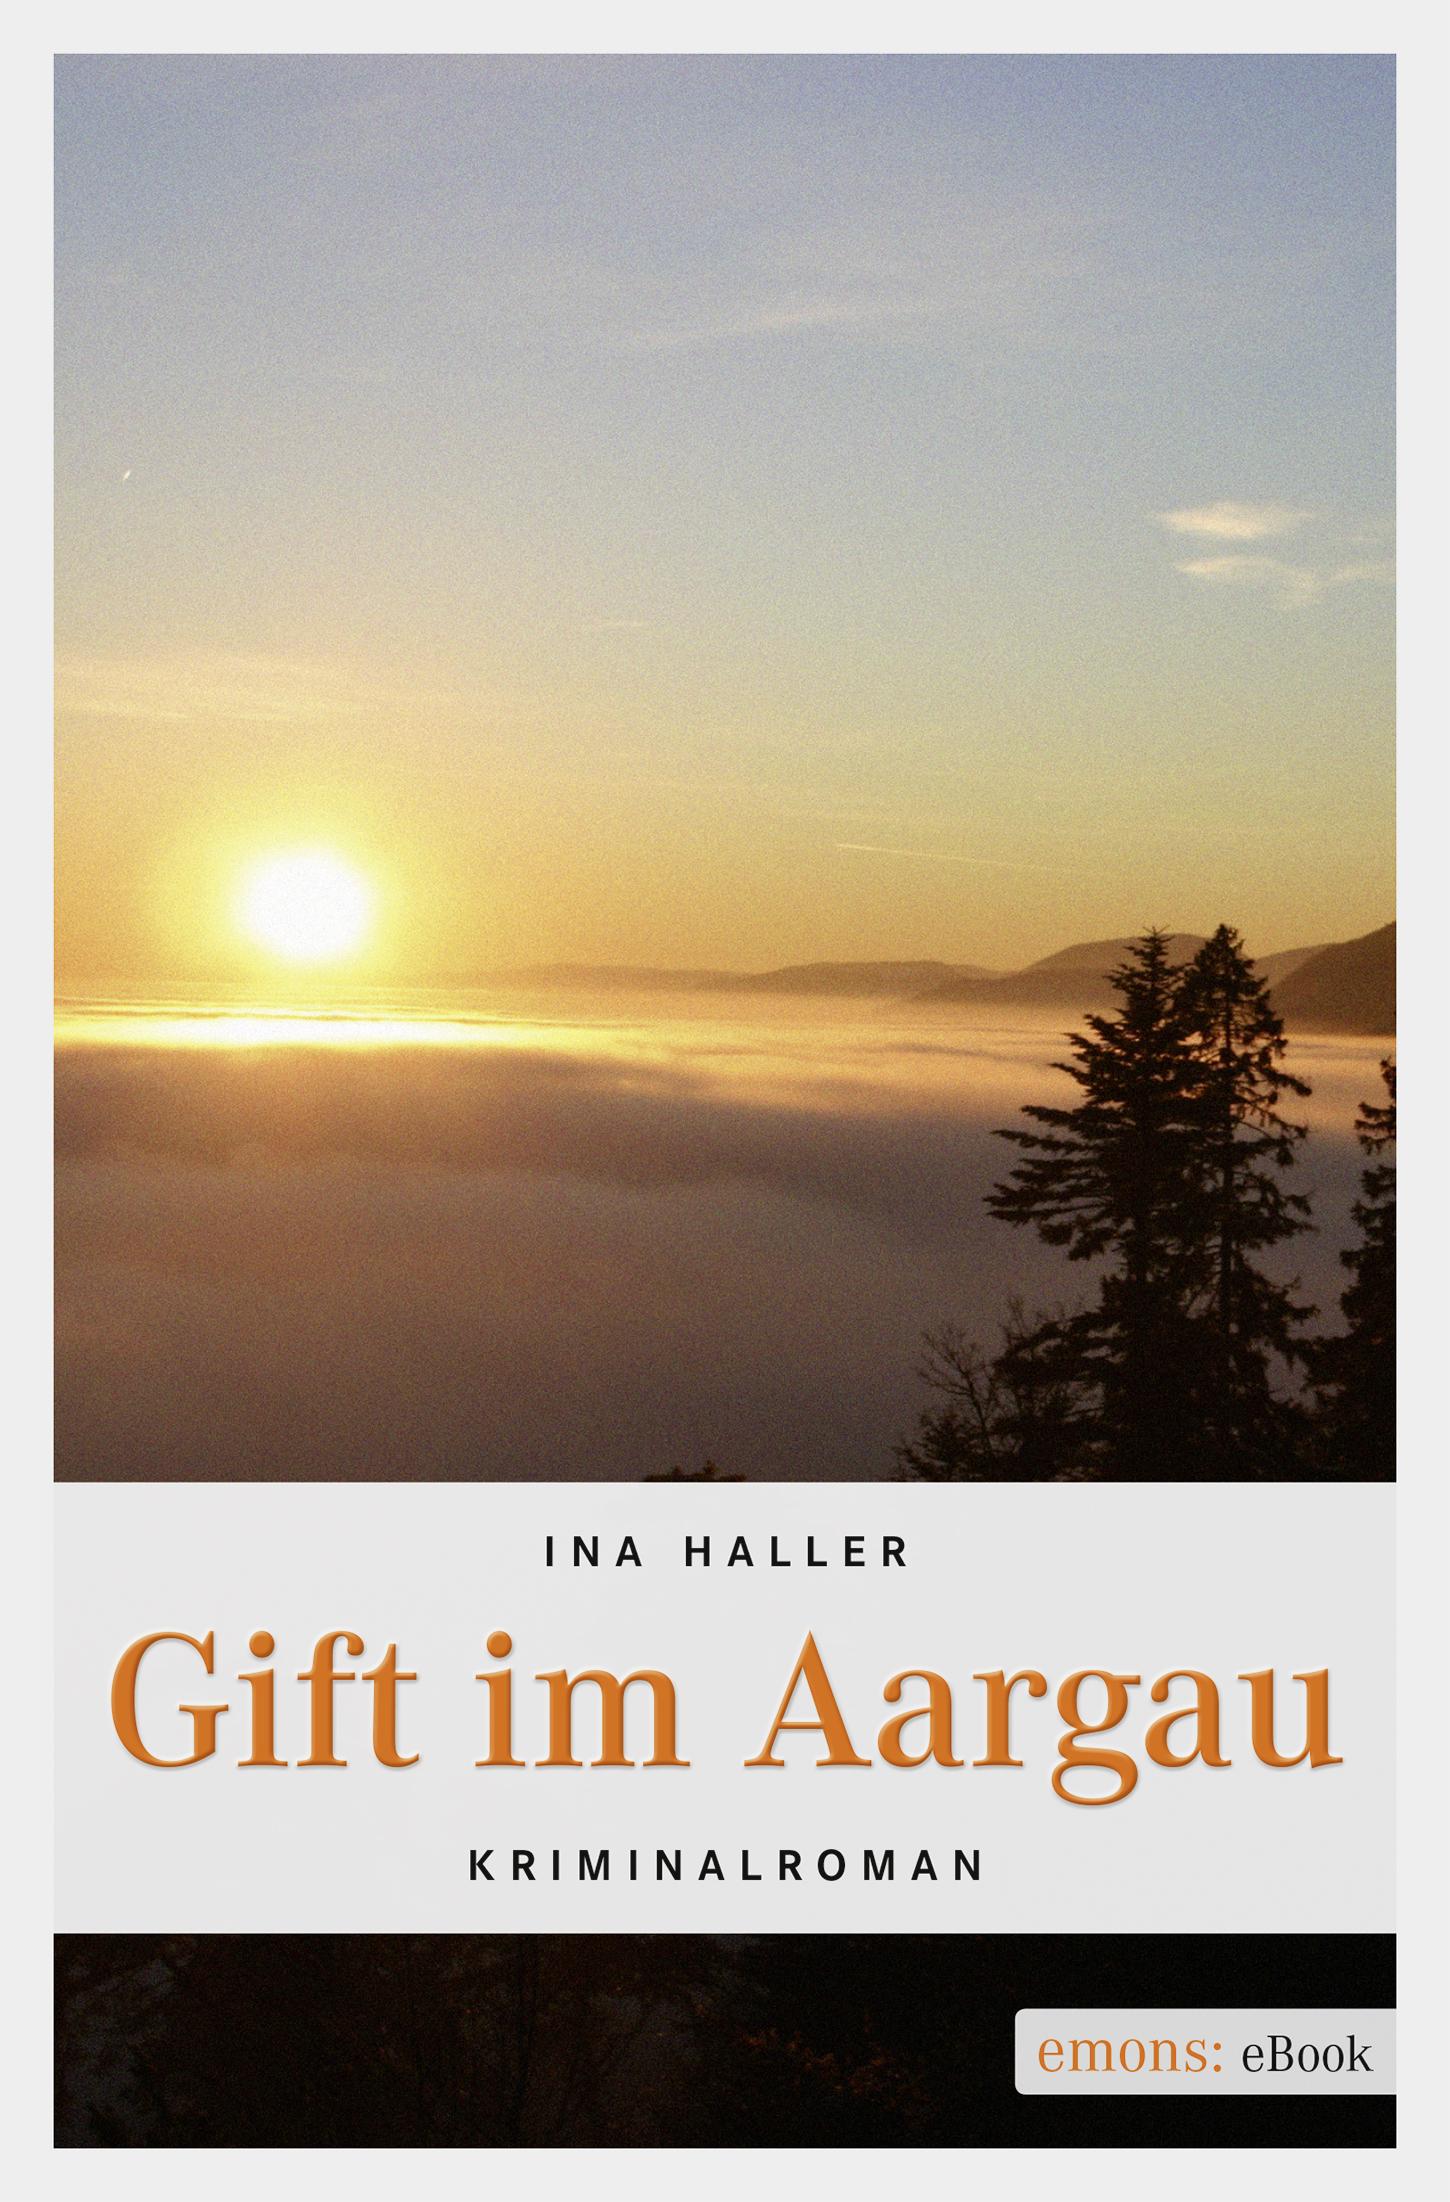 Ina Haller Gift im Aargau haller hamburg